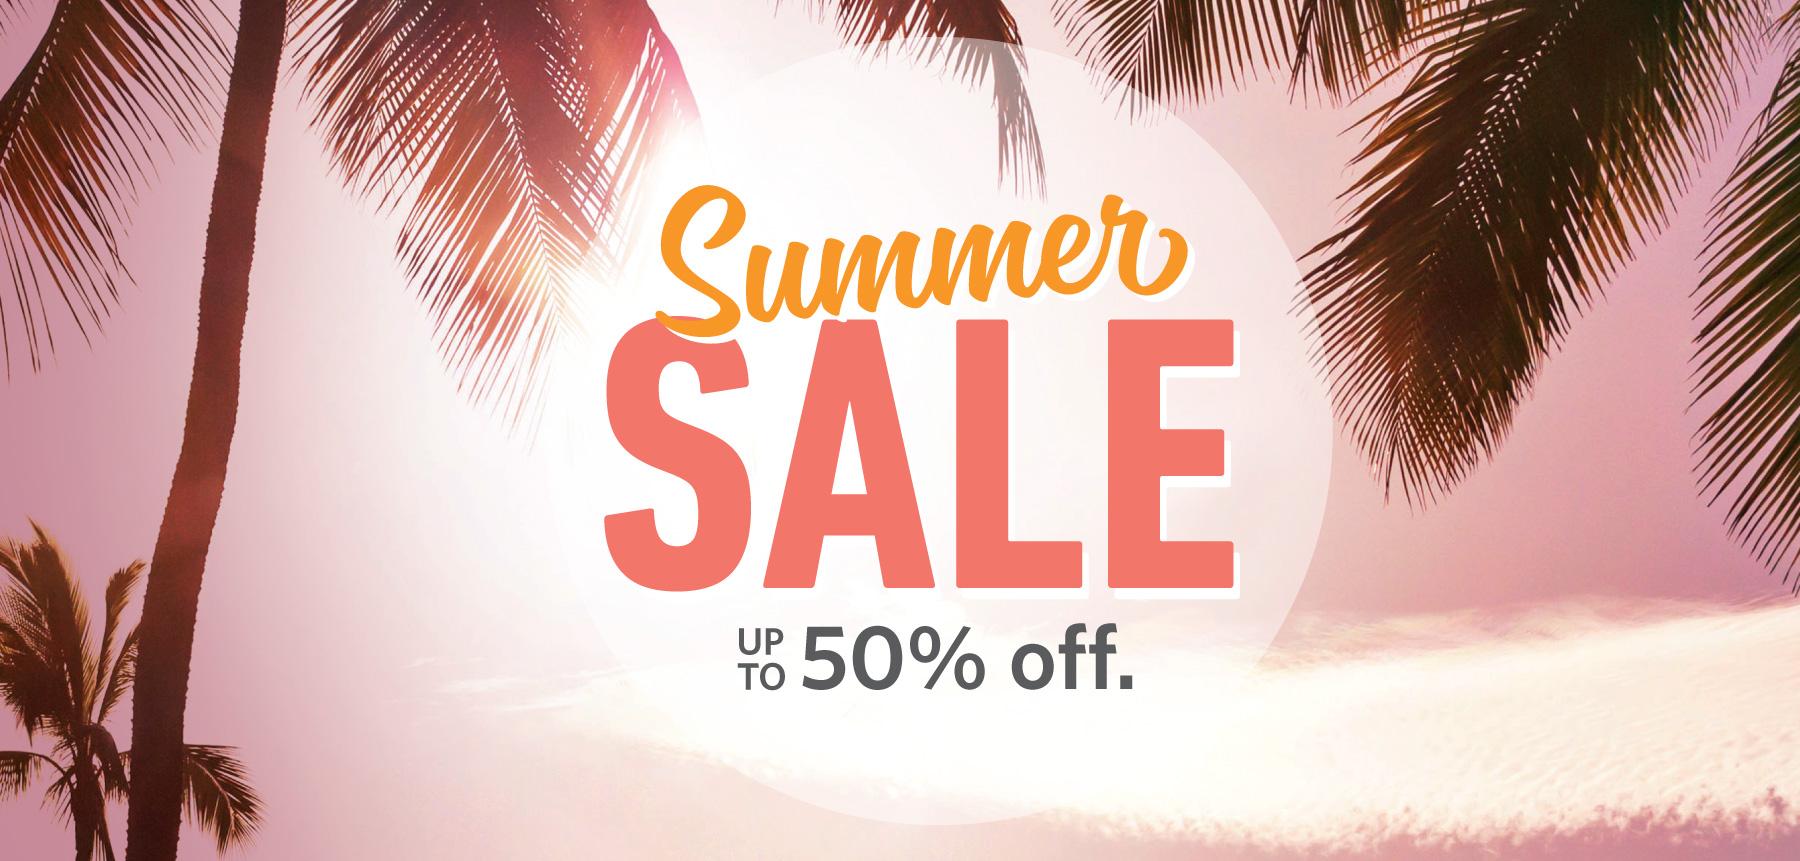 01-summer-sale.jpg